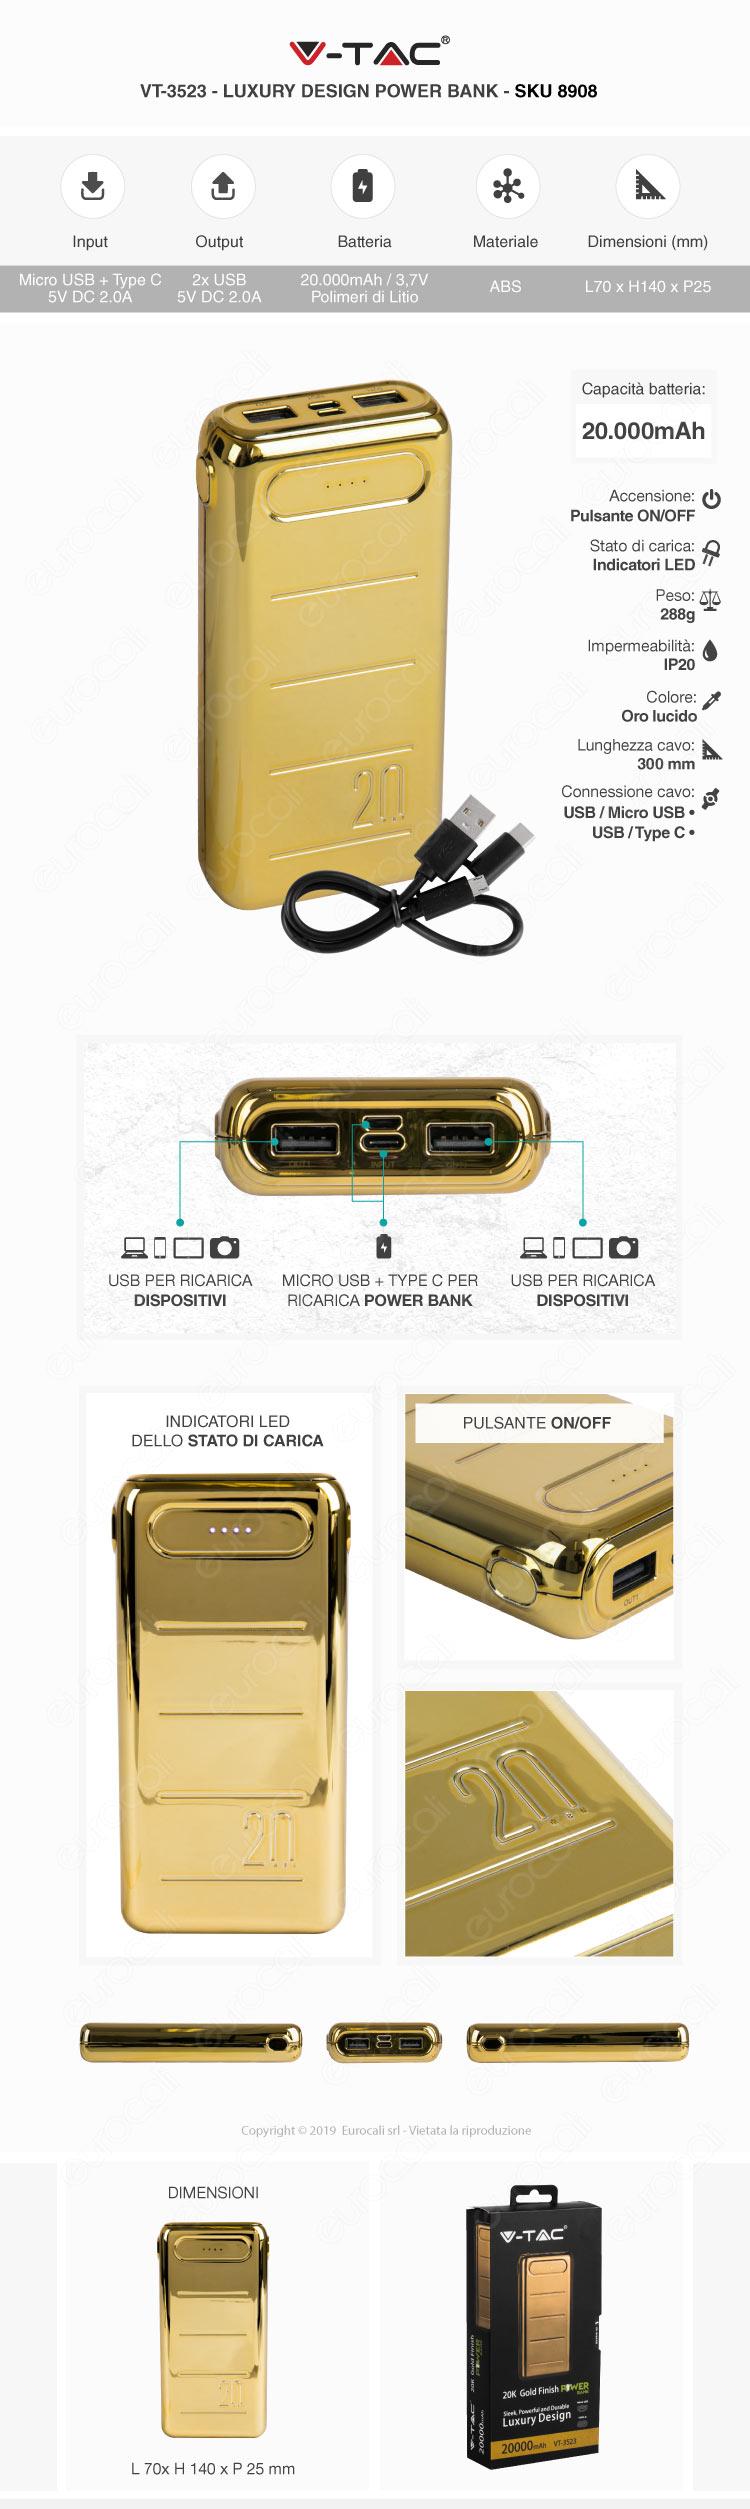 V-Tac VT-3523 Power Bank Portatile 20000 mAh 2 Uscite USB 2.0A